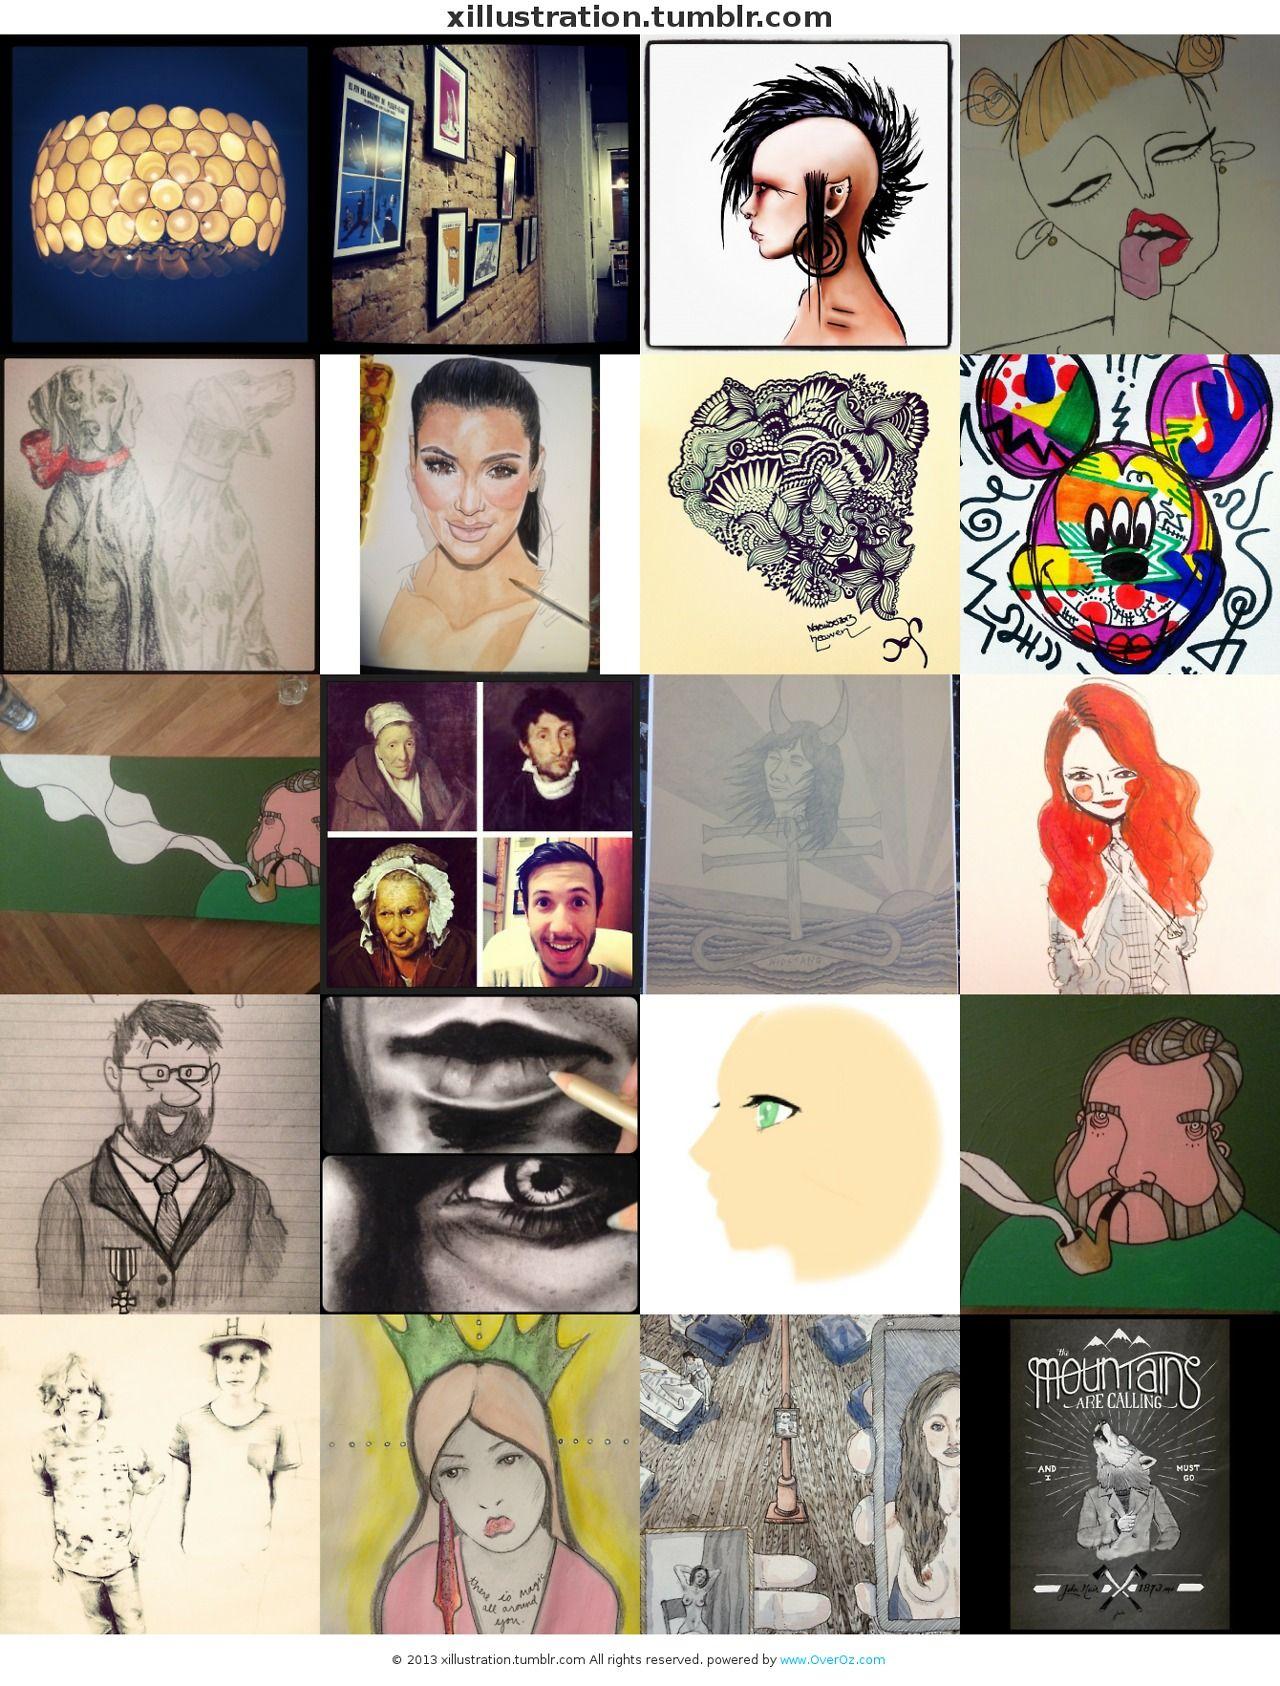 illustration - Source: http://xillustration.tumblr.com